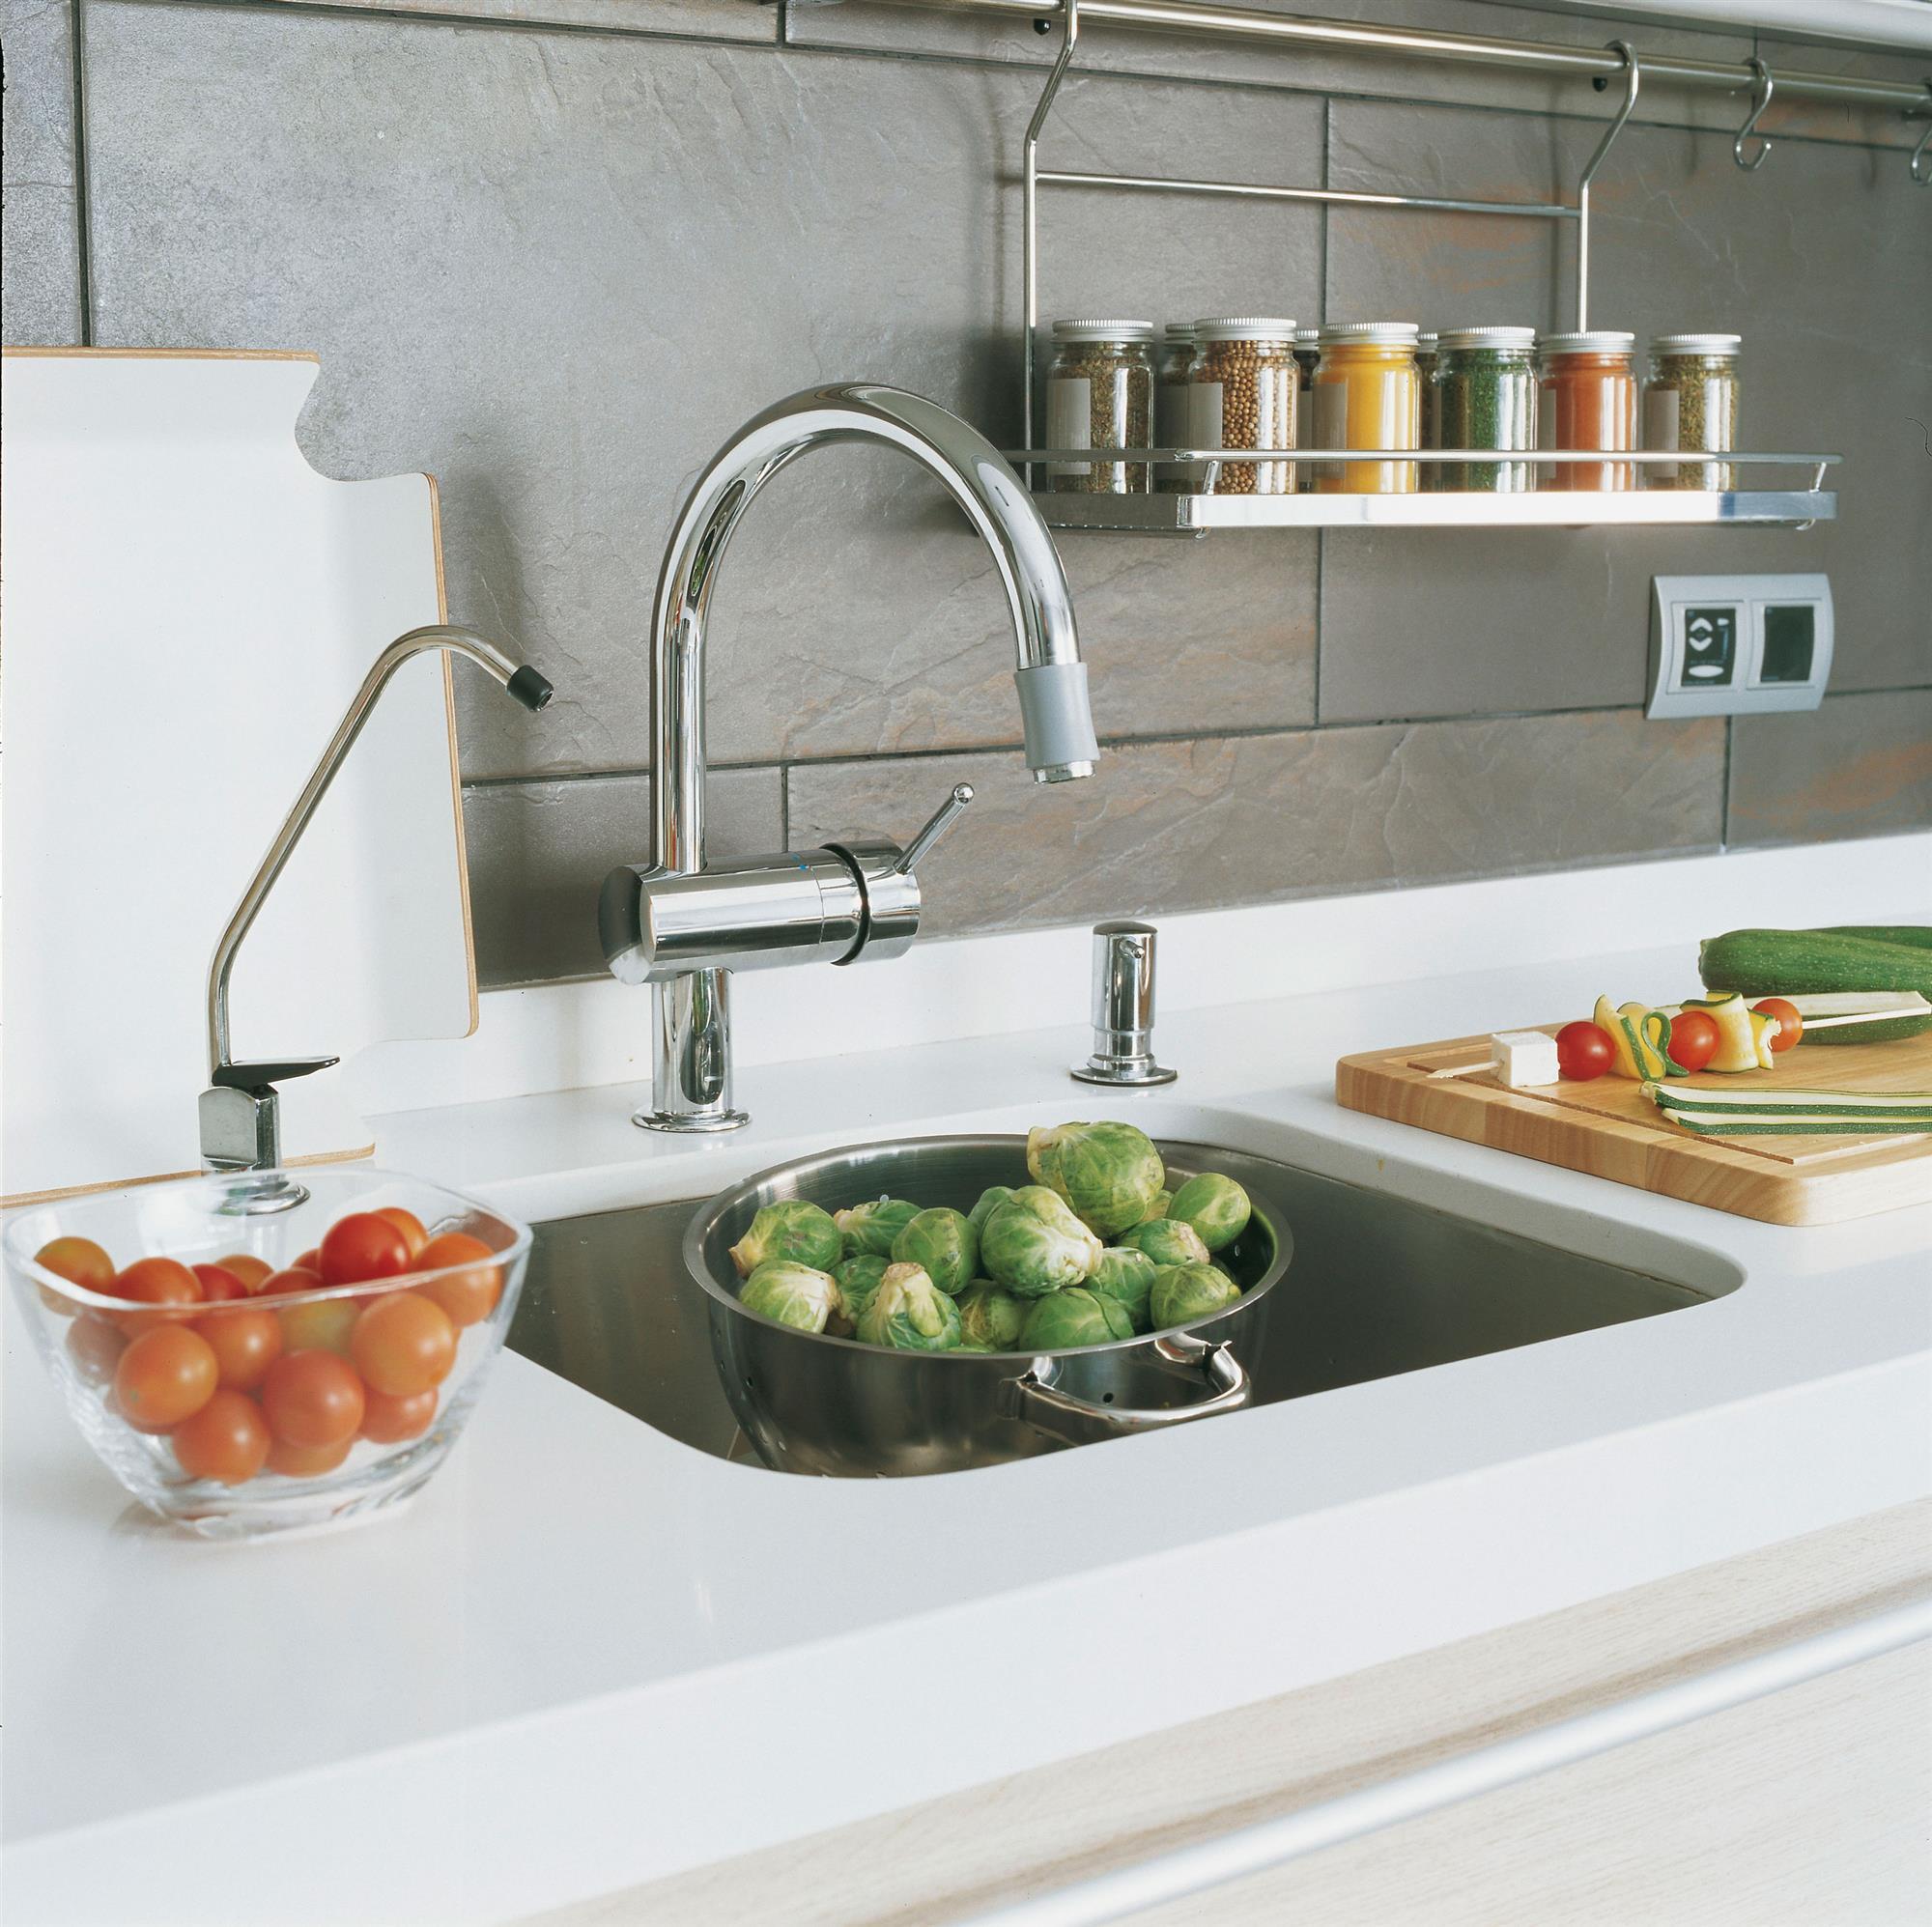 Salpicadero de cocina latest cocinas de vidrio pared trasera protector contra cocina pared de - Protector antisalpicaduras cocina ...